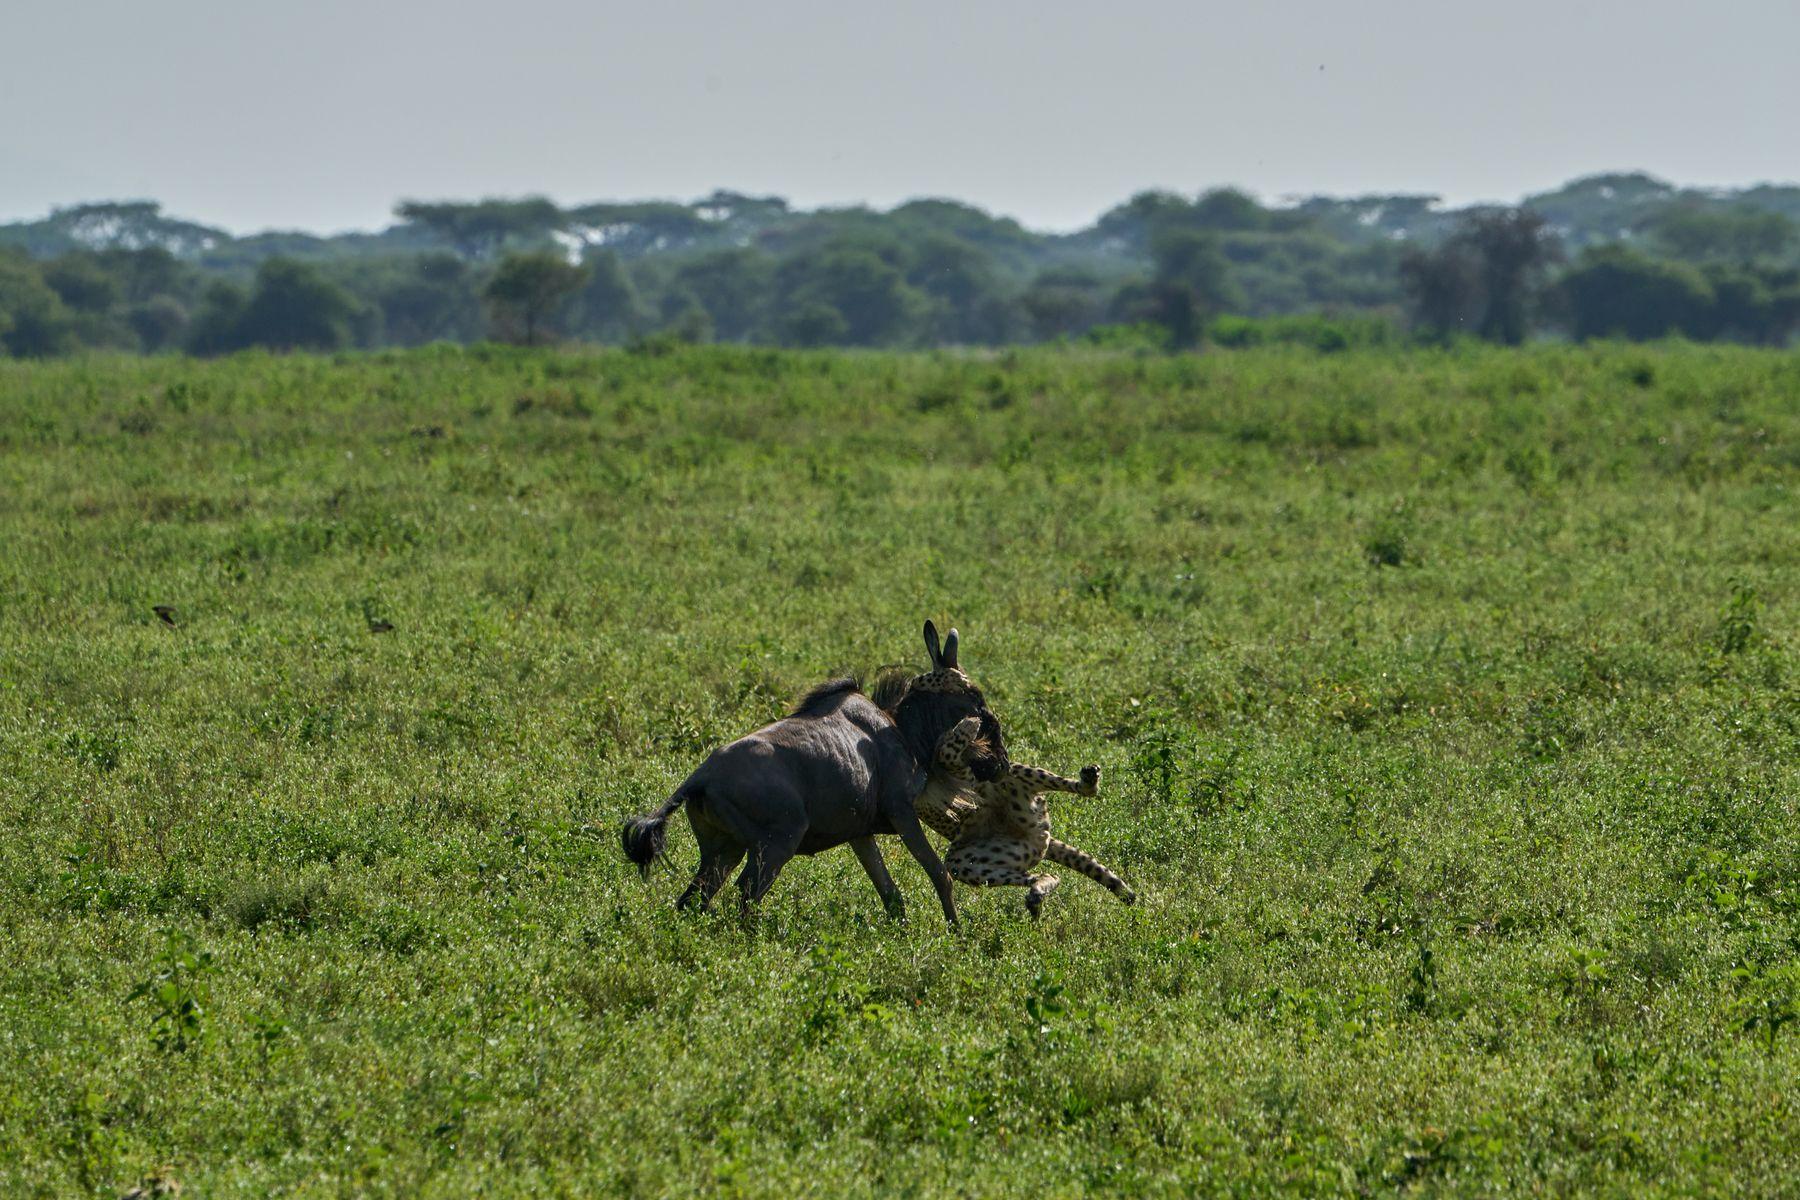 Гепард на охоте Танзания Нгоронгоро Африка природа животные кошки гепарды охота гну антилопа